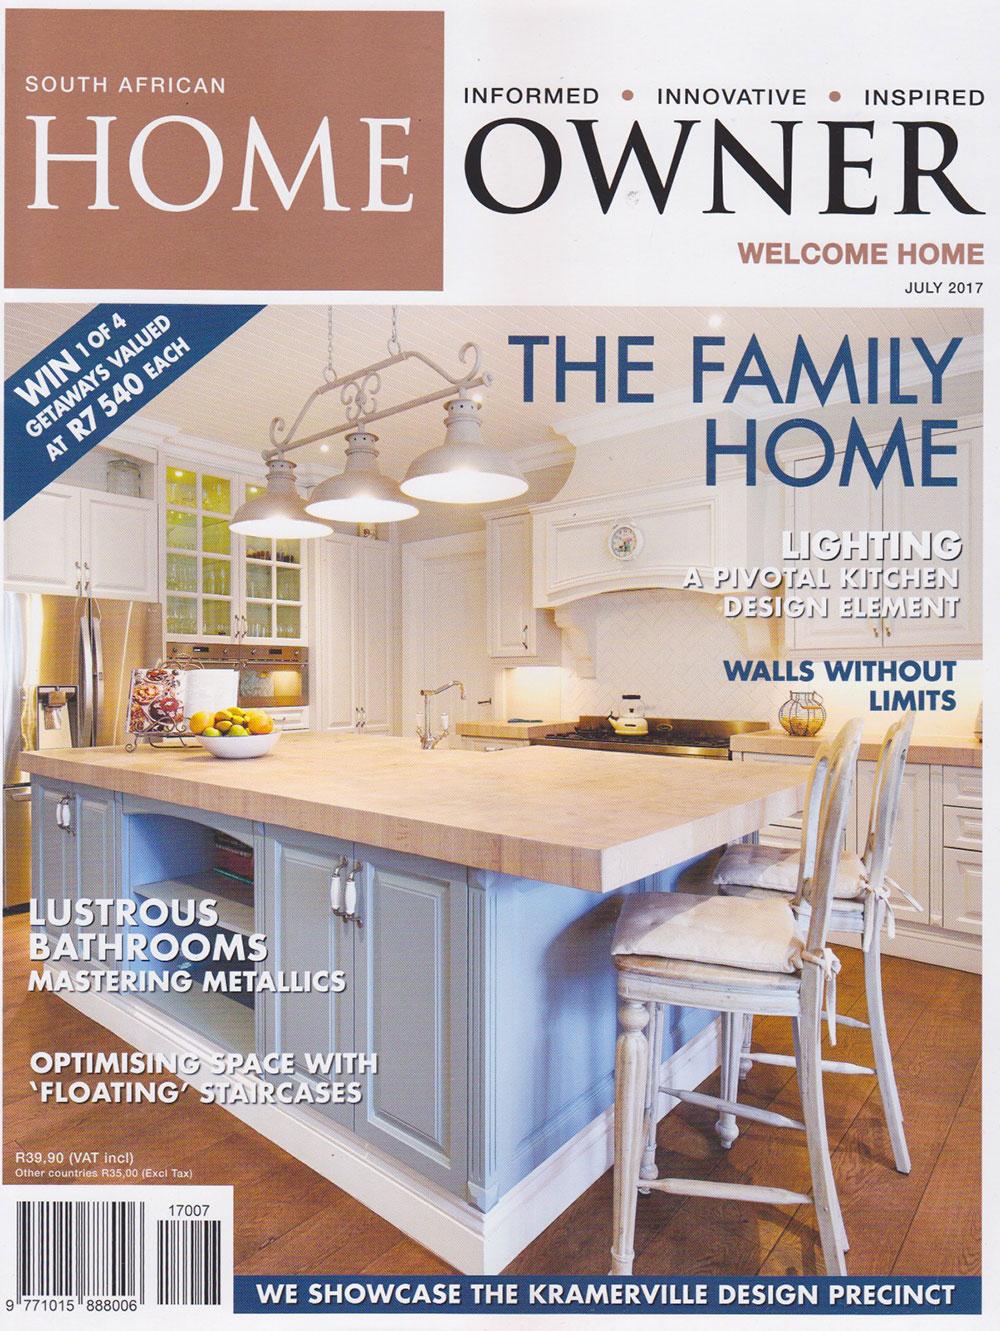 homeowner1